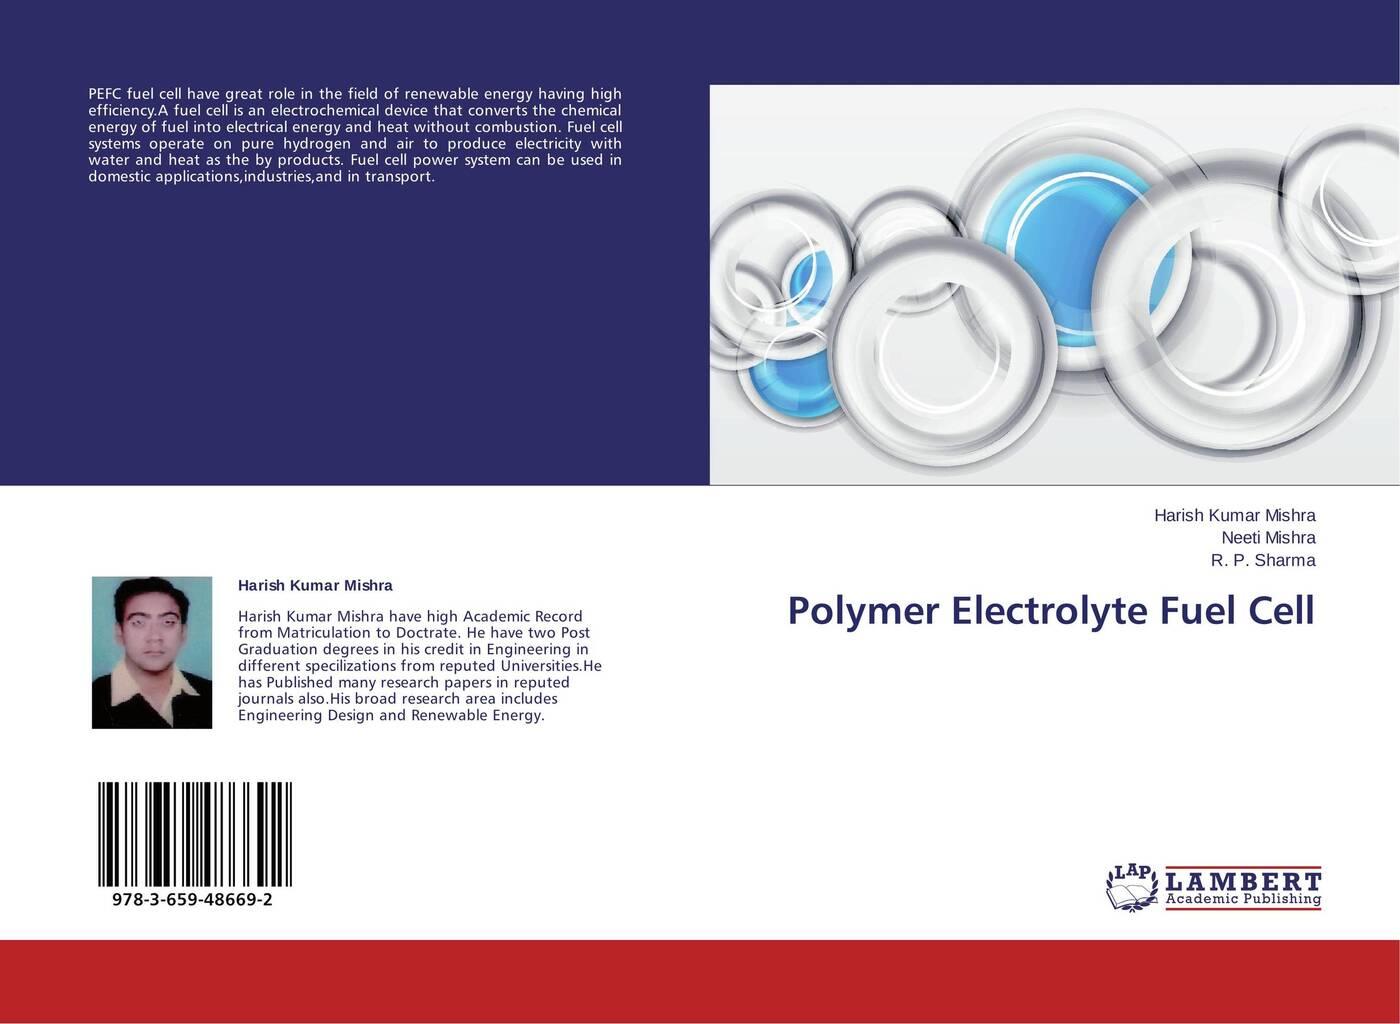 Harish Kumar Mishra,Neeti Mishra and R. P. Sharma Polymer Electrolyte Fuel Cell недорого